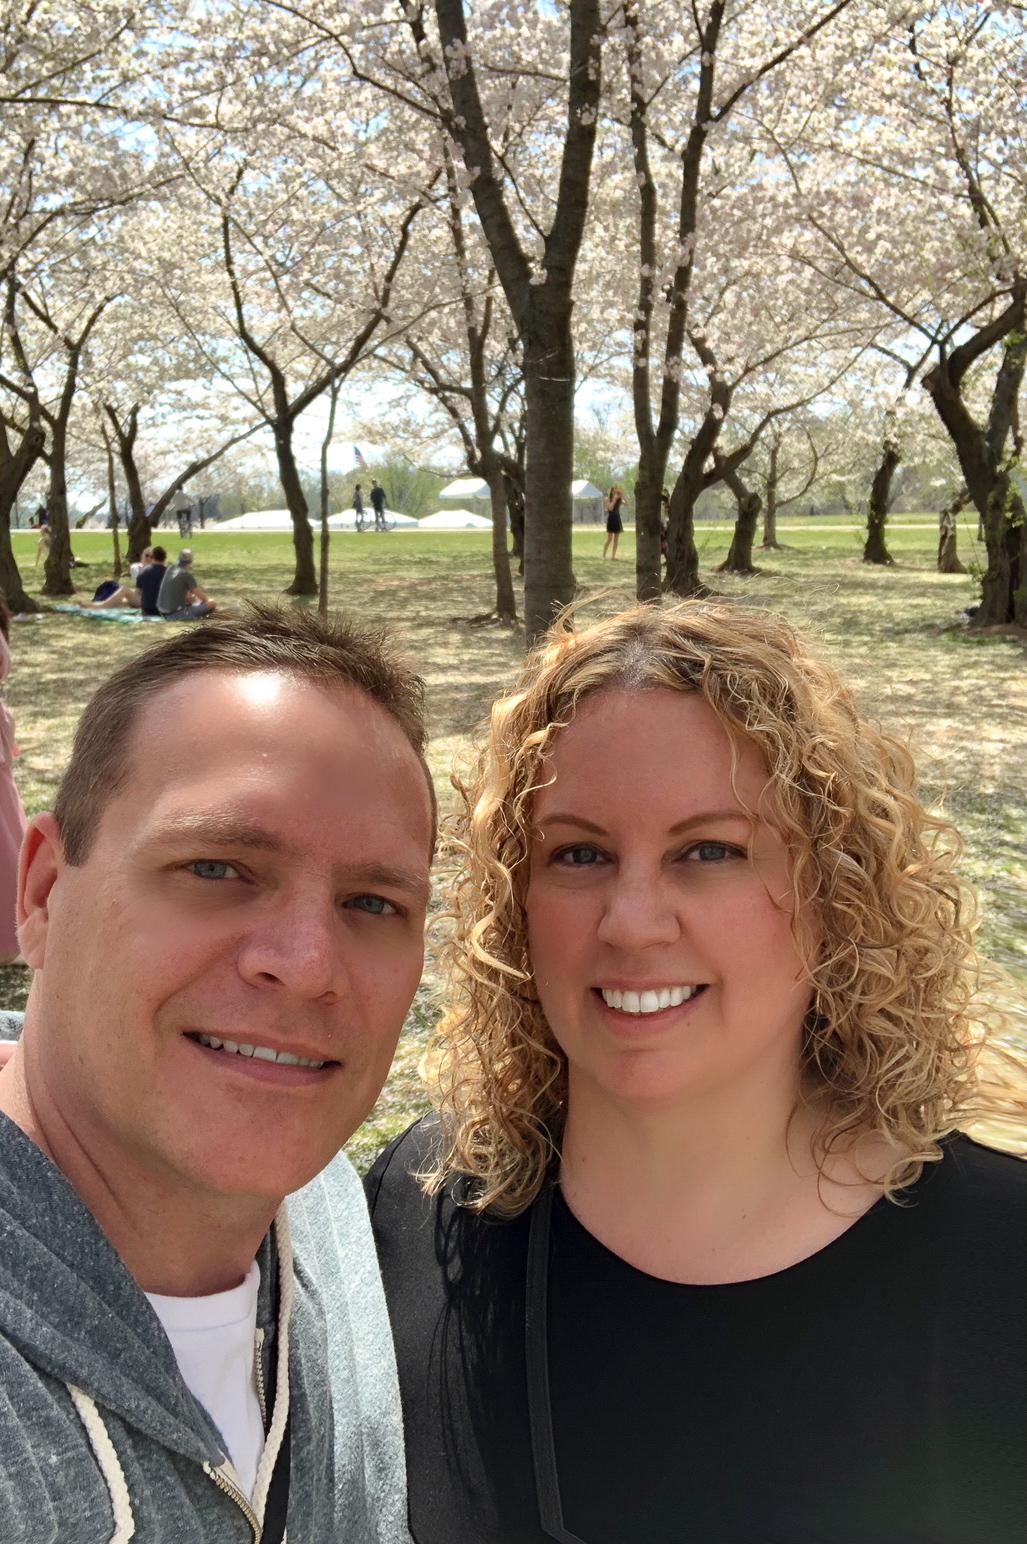 Keri Michael Adopt Adoptive Parents Adoption Newborn Baby Unplanned pregnancy pregnant help